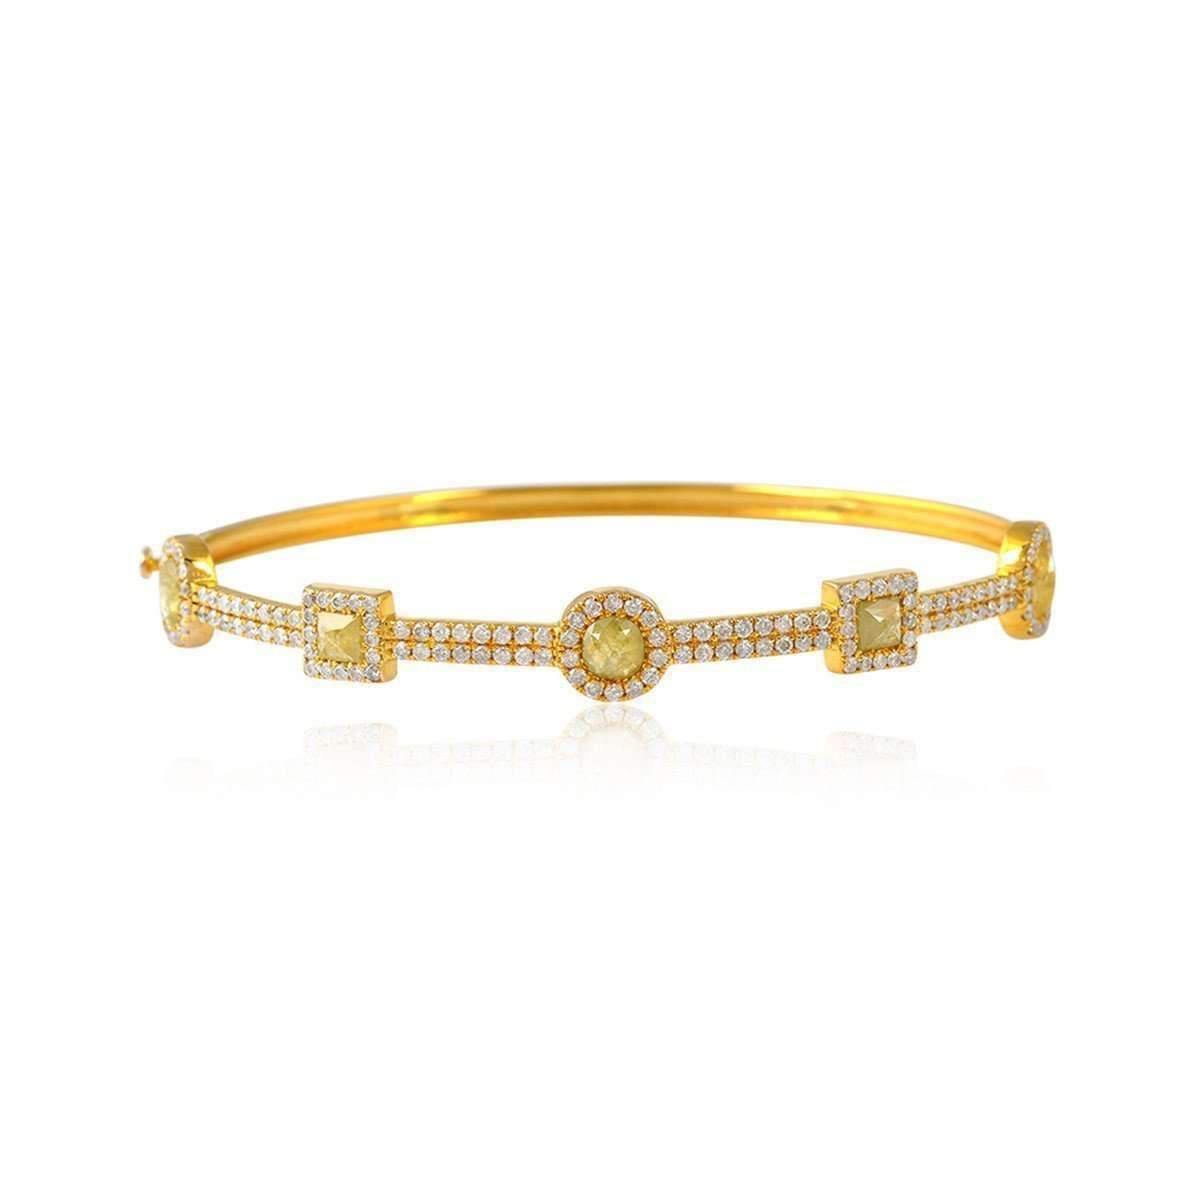 Socheec Divine Gold and Diamond Bangle Eha3PC74